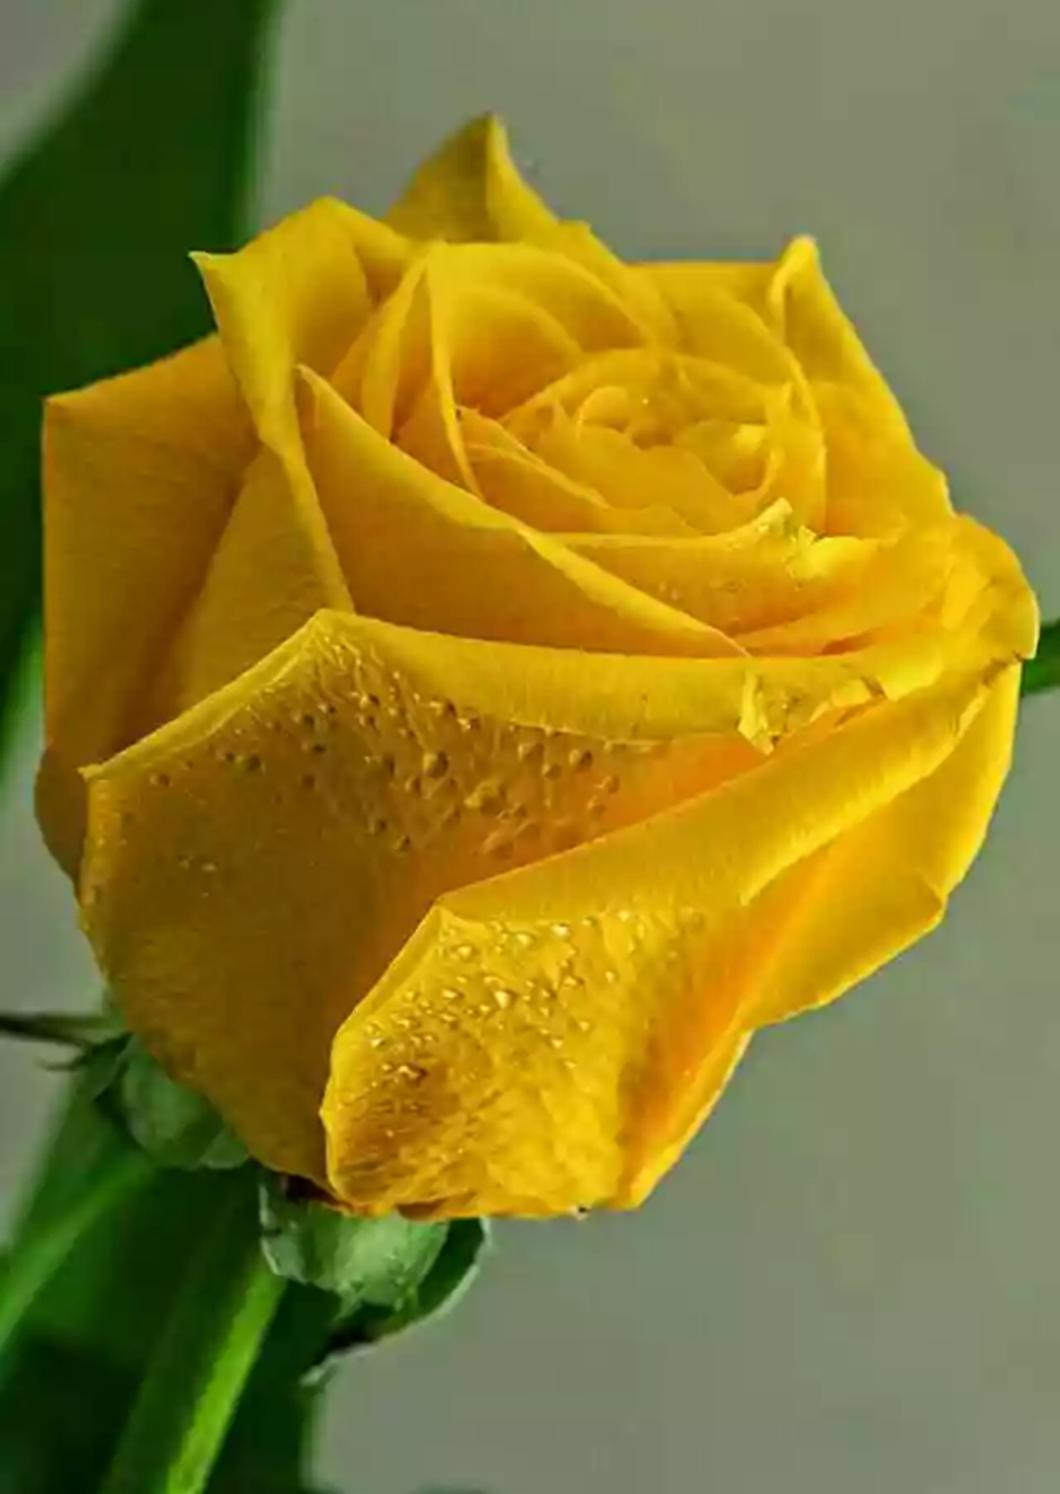 yellow love rose - 736×1037